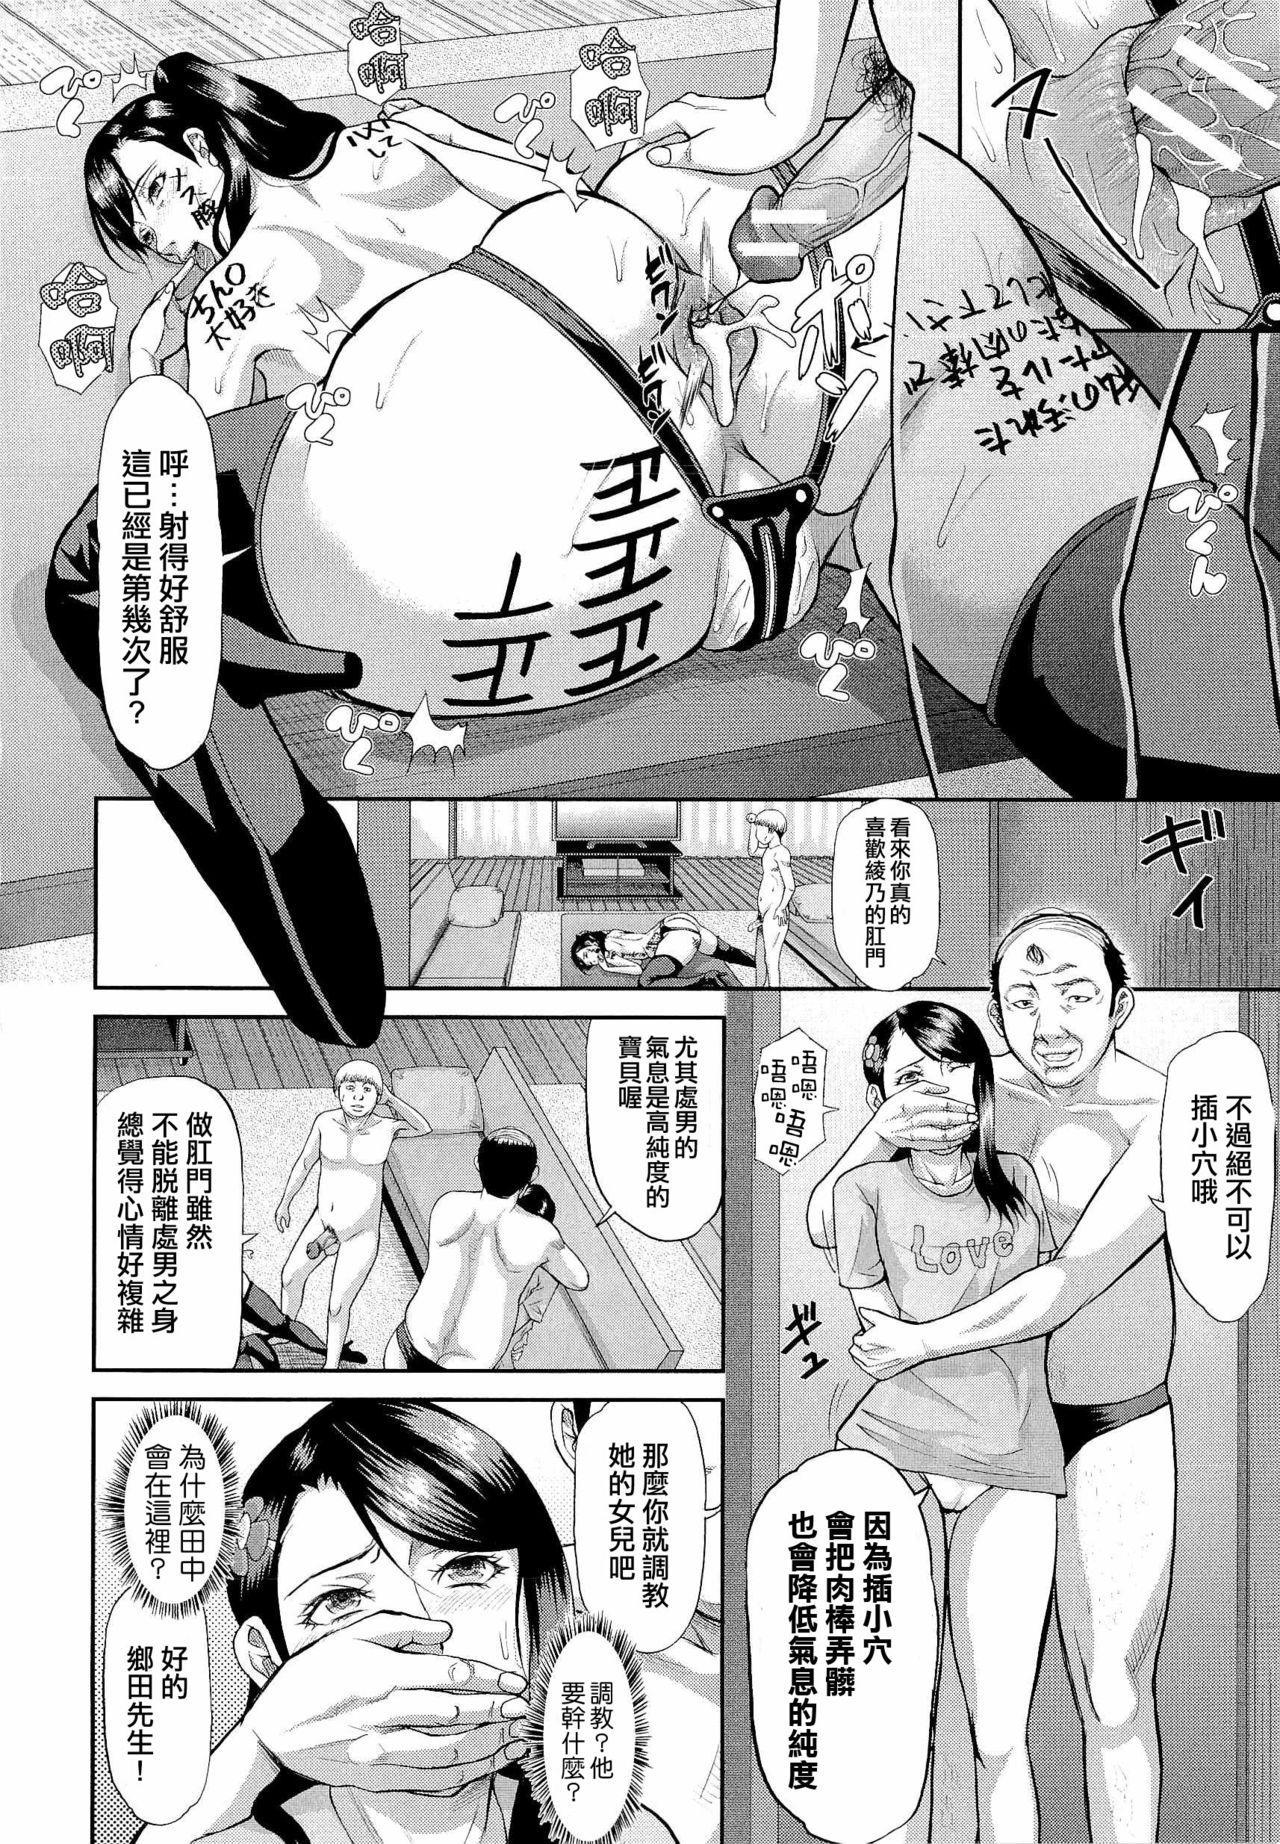 [Honebuto Danshaku] Innou Kaizou Program ~Oyako Zecchou Cult Ochi~ [Chinese]【不想记名重嵌--高质量图源】 43